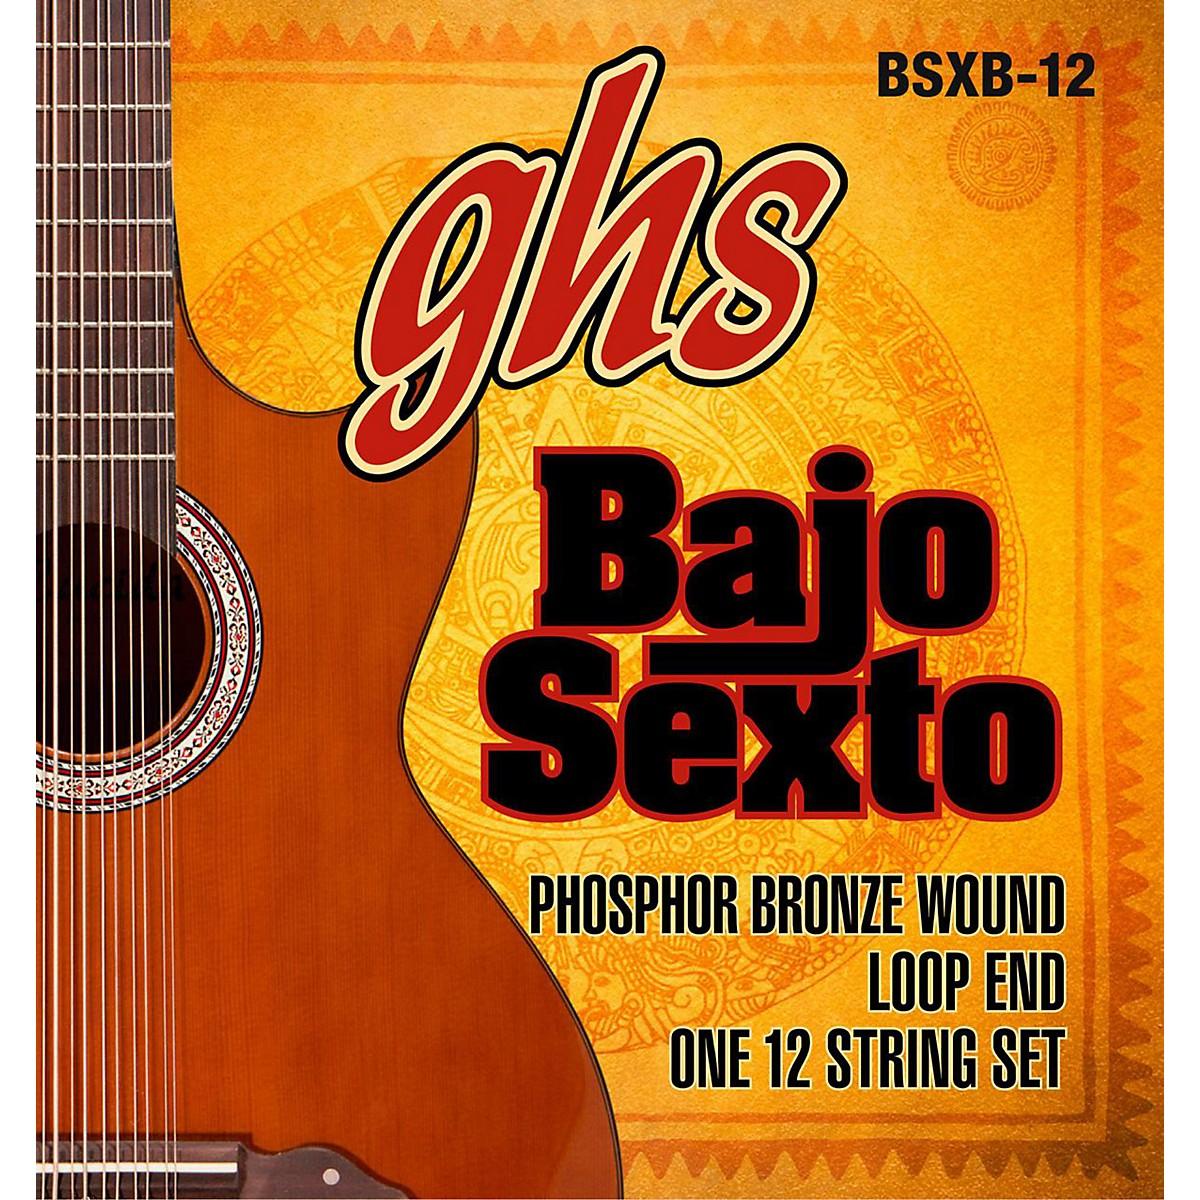 GHS Bajo Sexto 12-String Phosphor Bronze Acoustic Guitar Strings